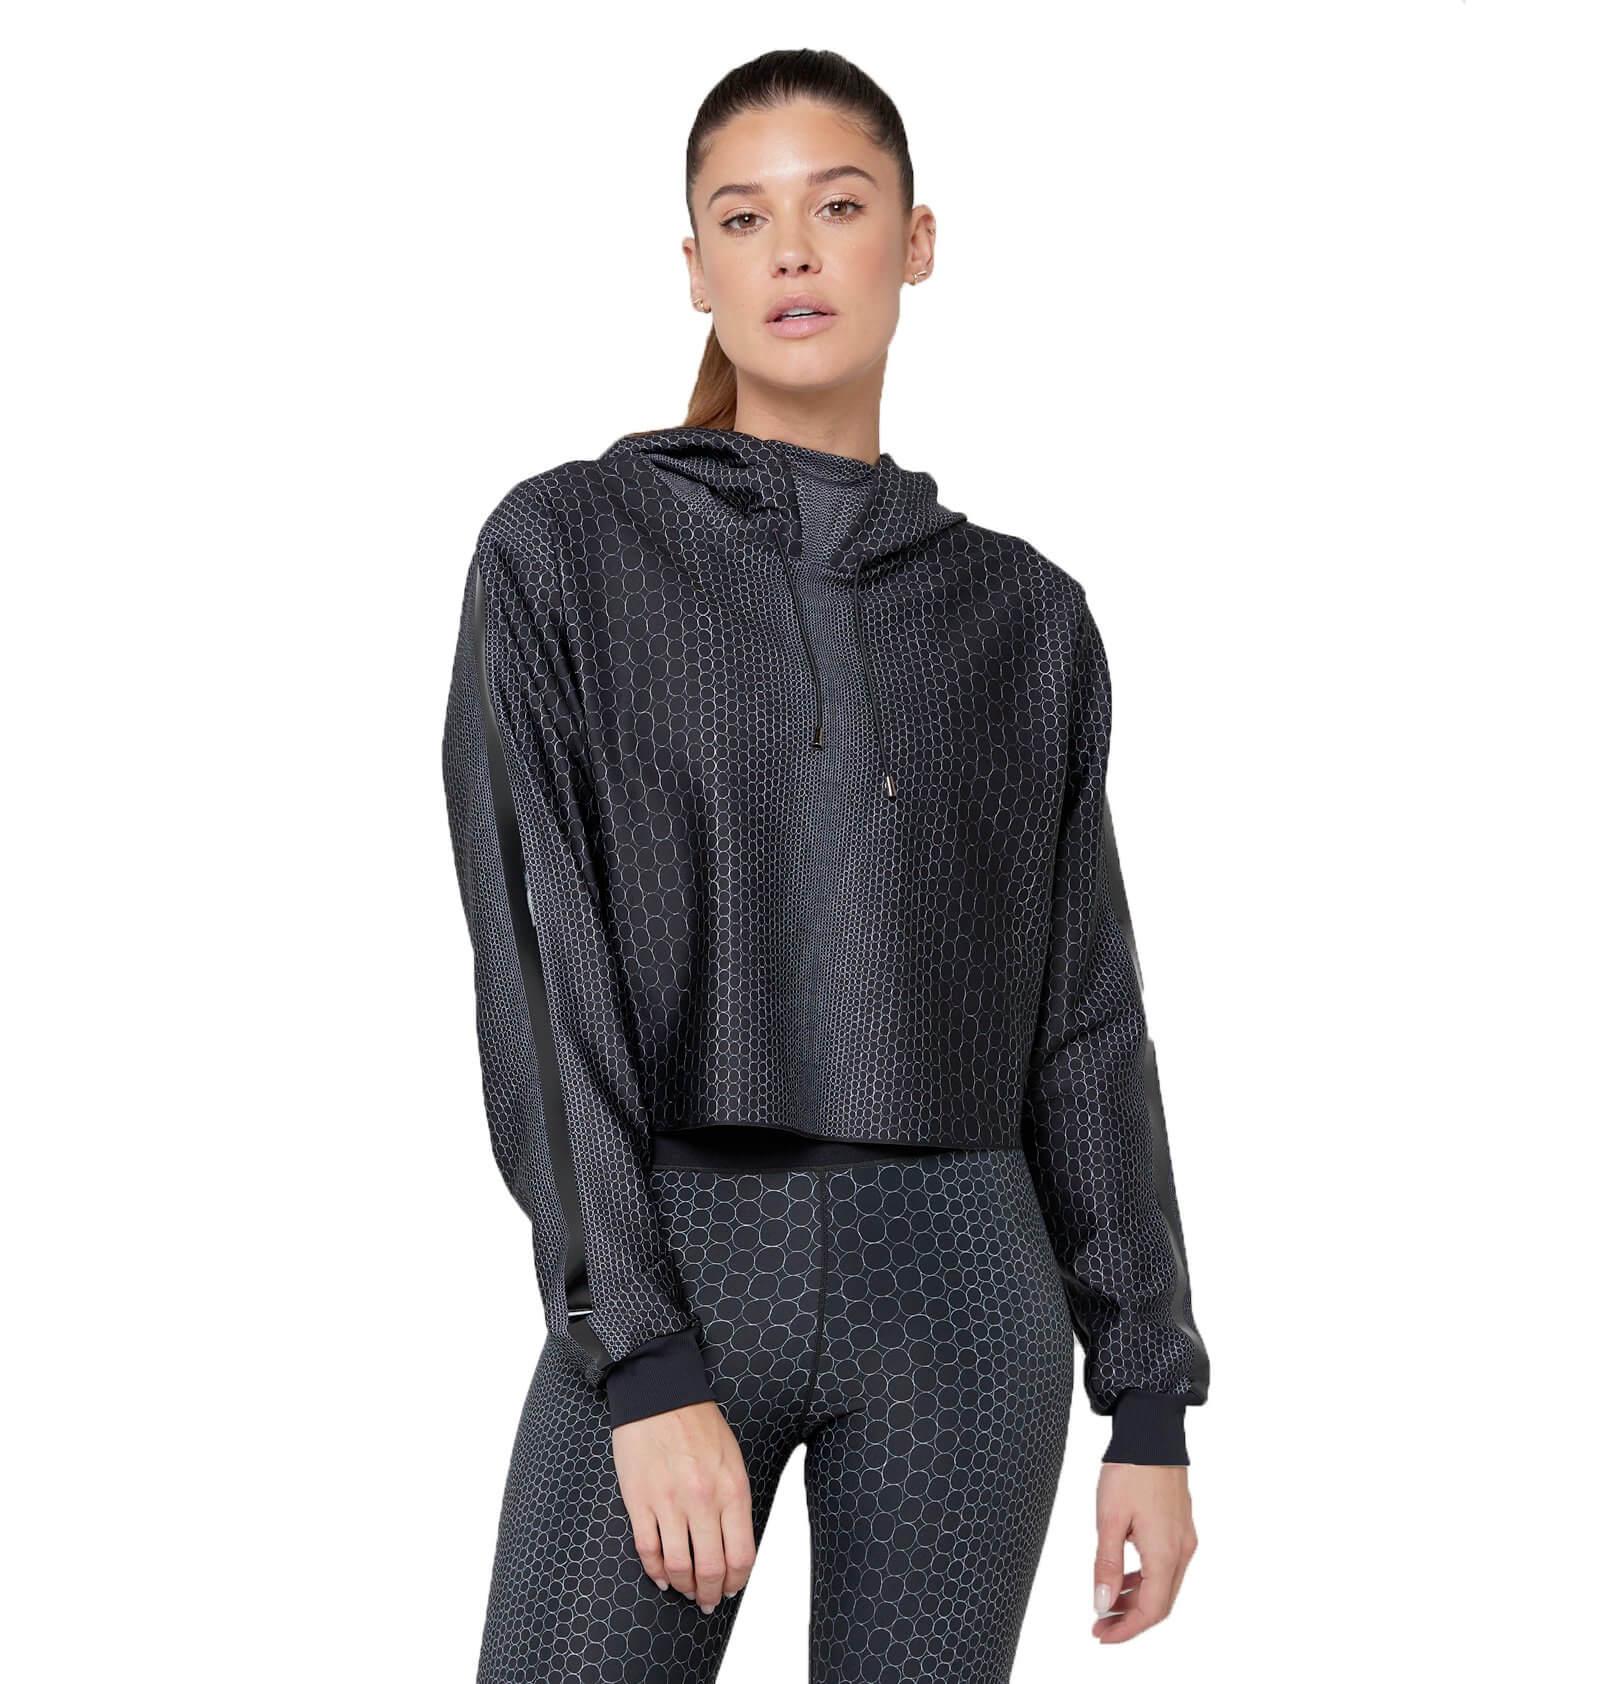 lacroix-pearls-nero-print-lynx-hoodie-front_1600x